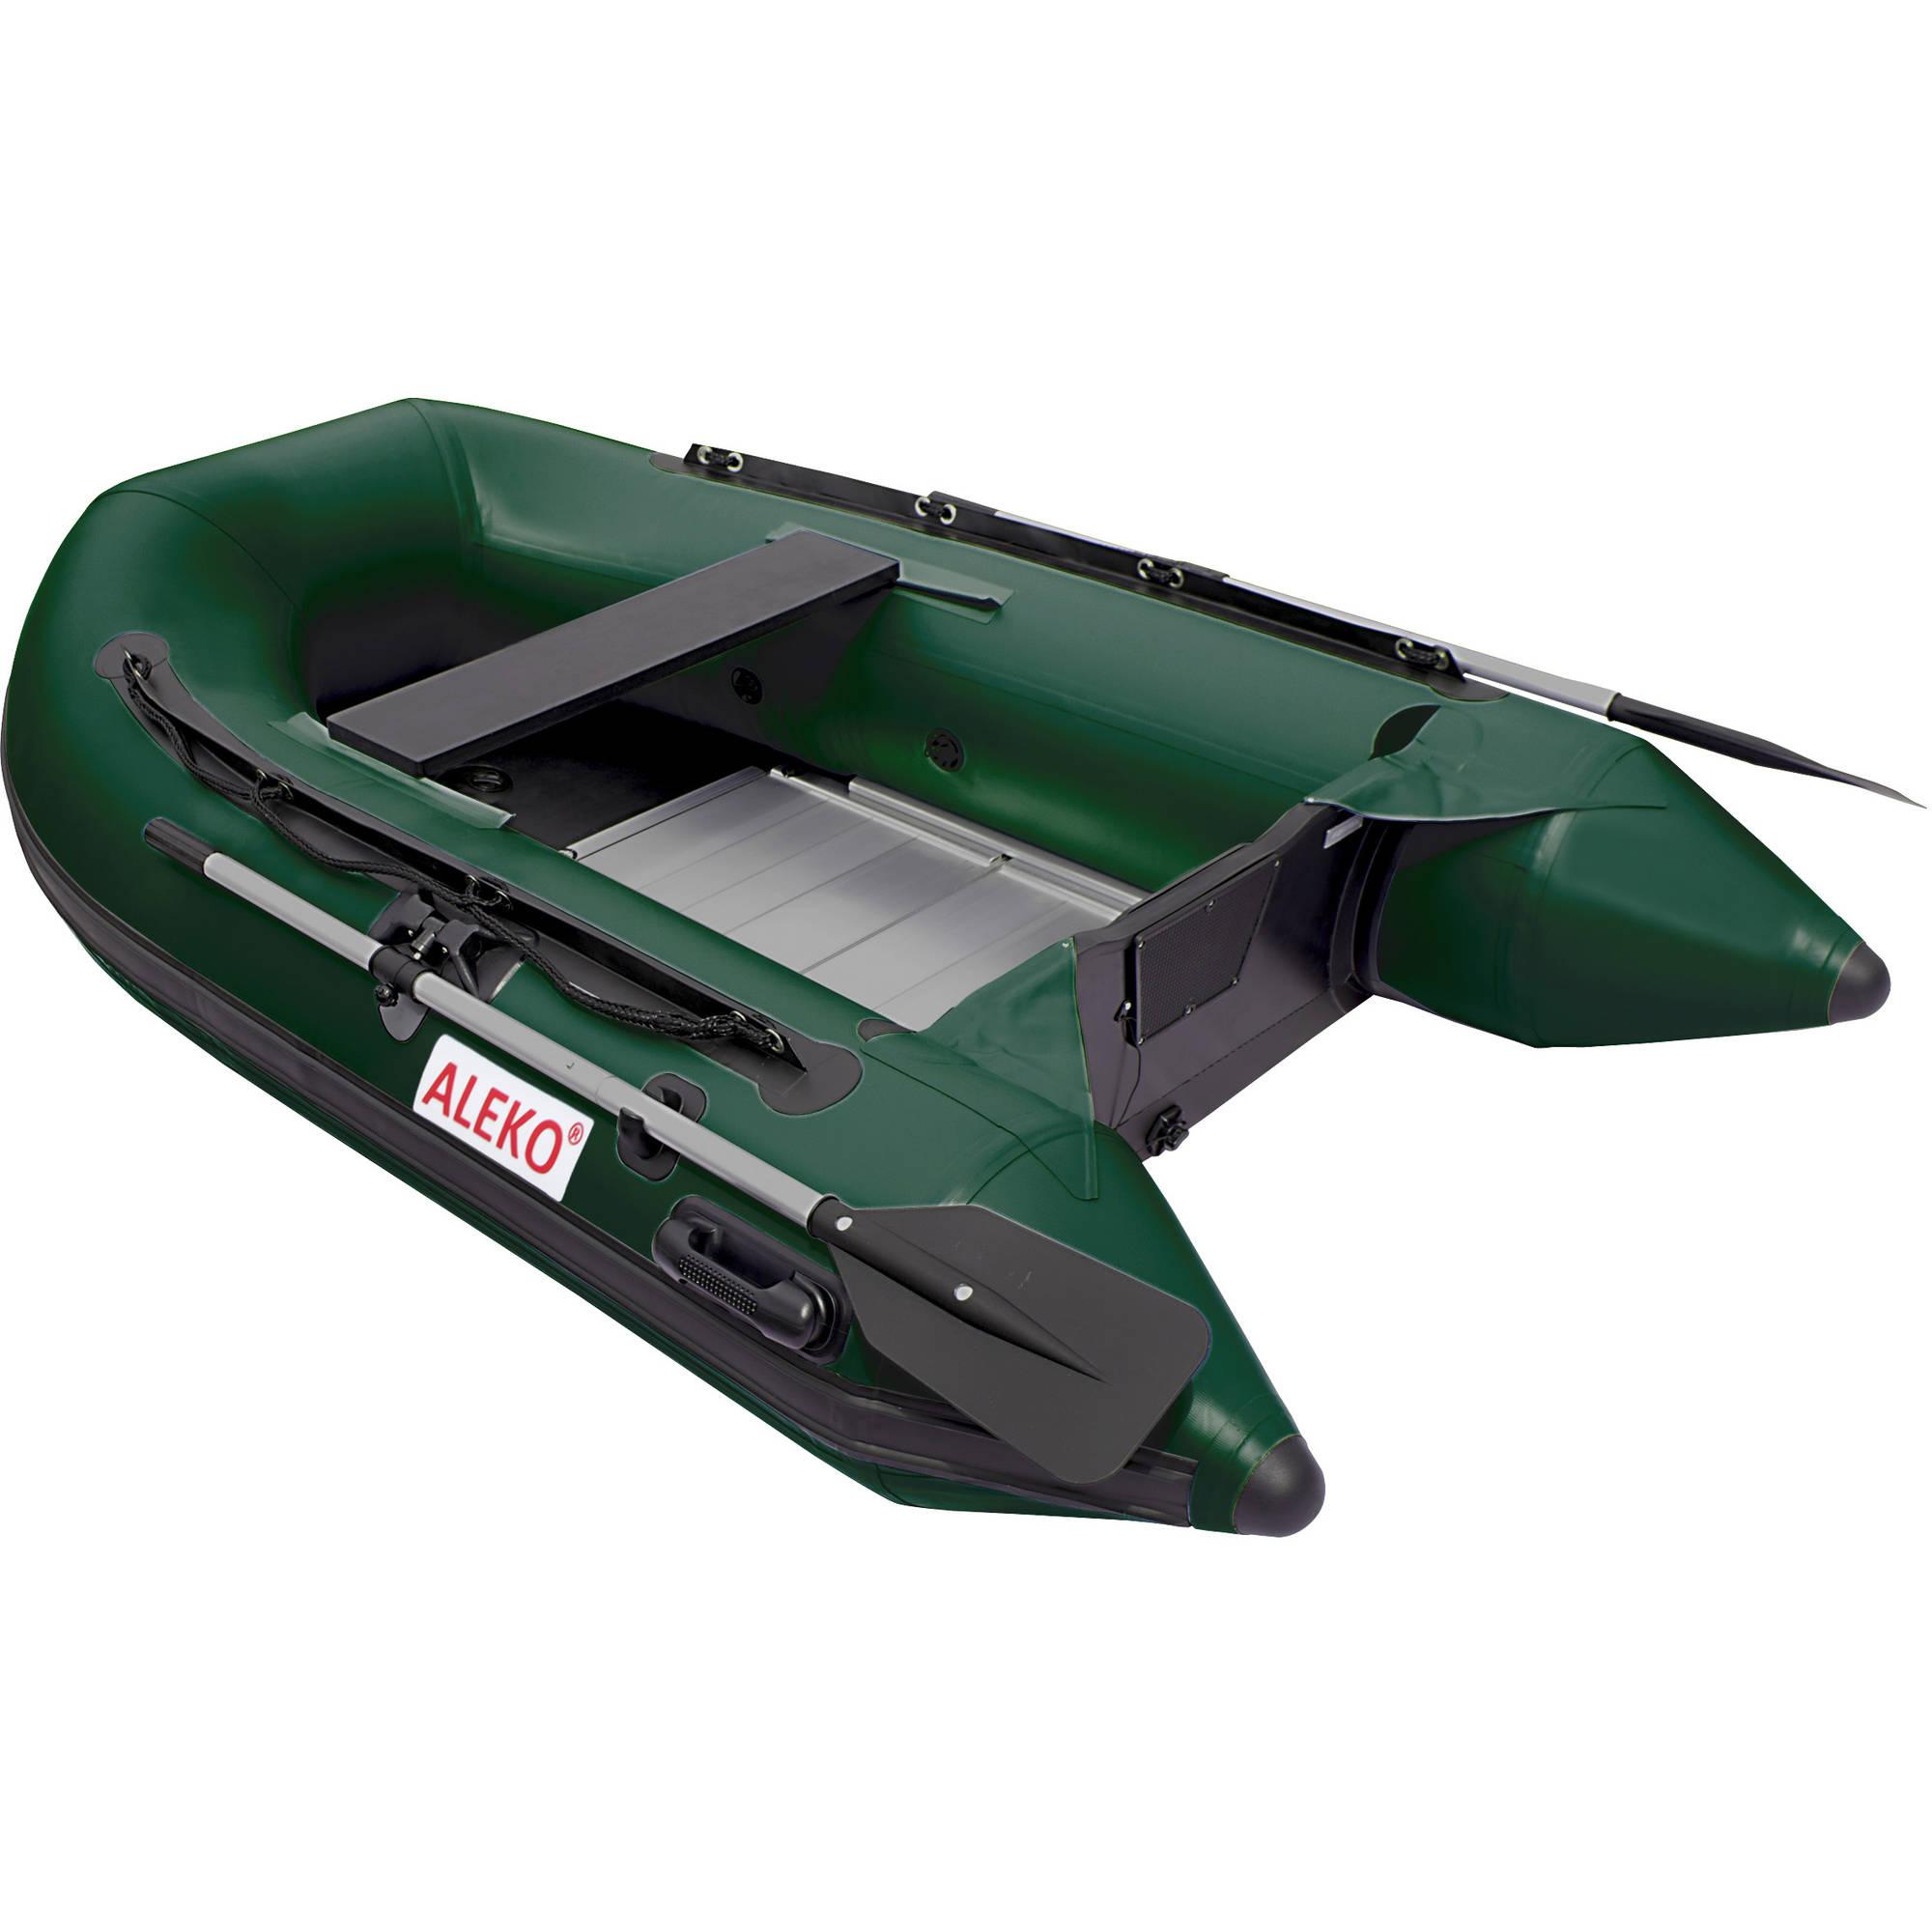 ALEKO Inflatable 3-Person Fishing Boat - Aluminum Floor - 8.4 Feet - Dark Green